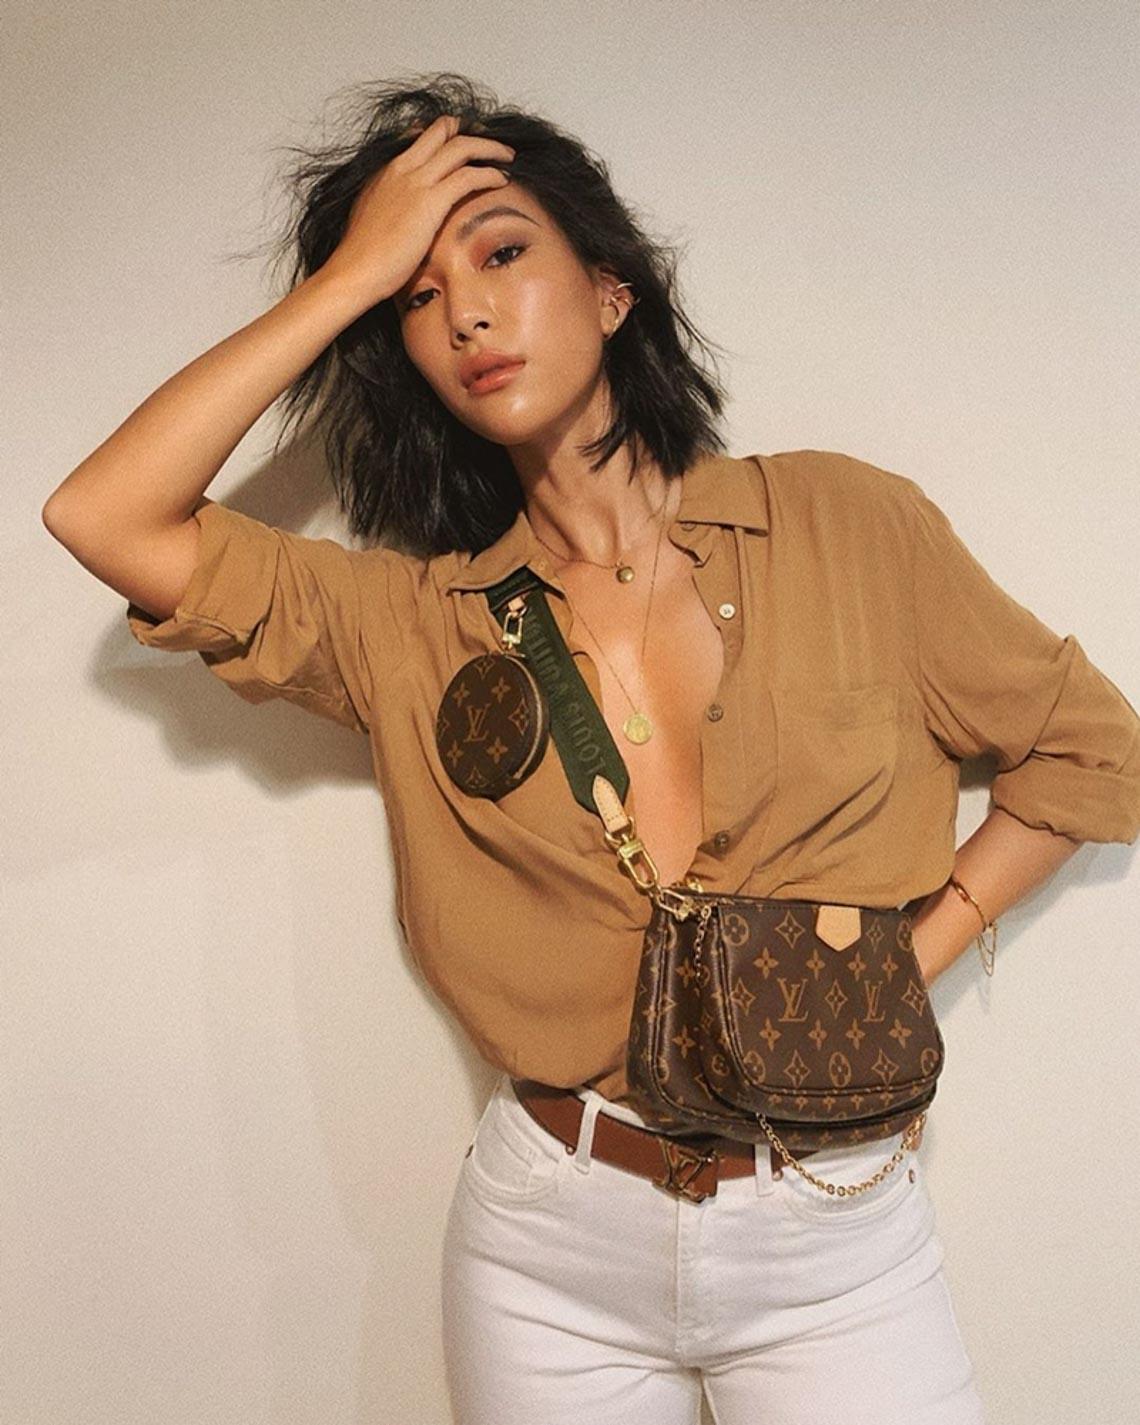 Multi Pochette - mẫu túi biến tấu mới của nhà Louis Vuitton - 10